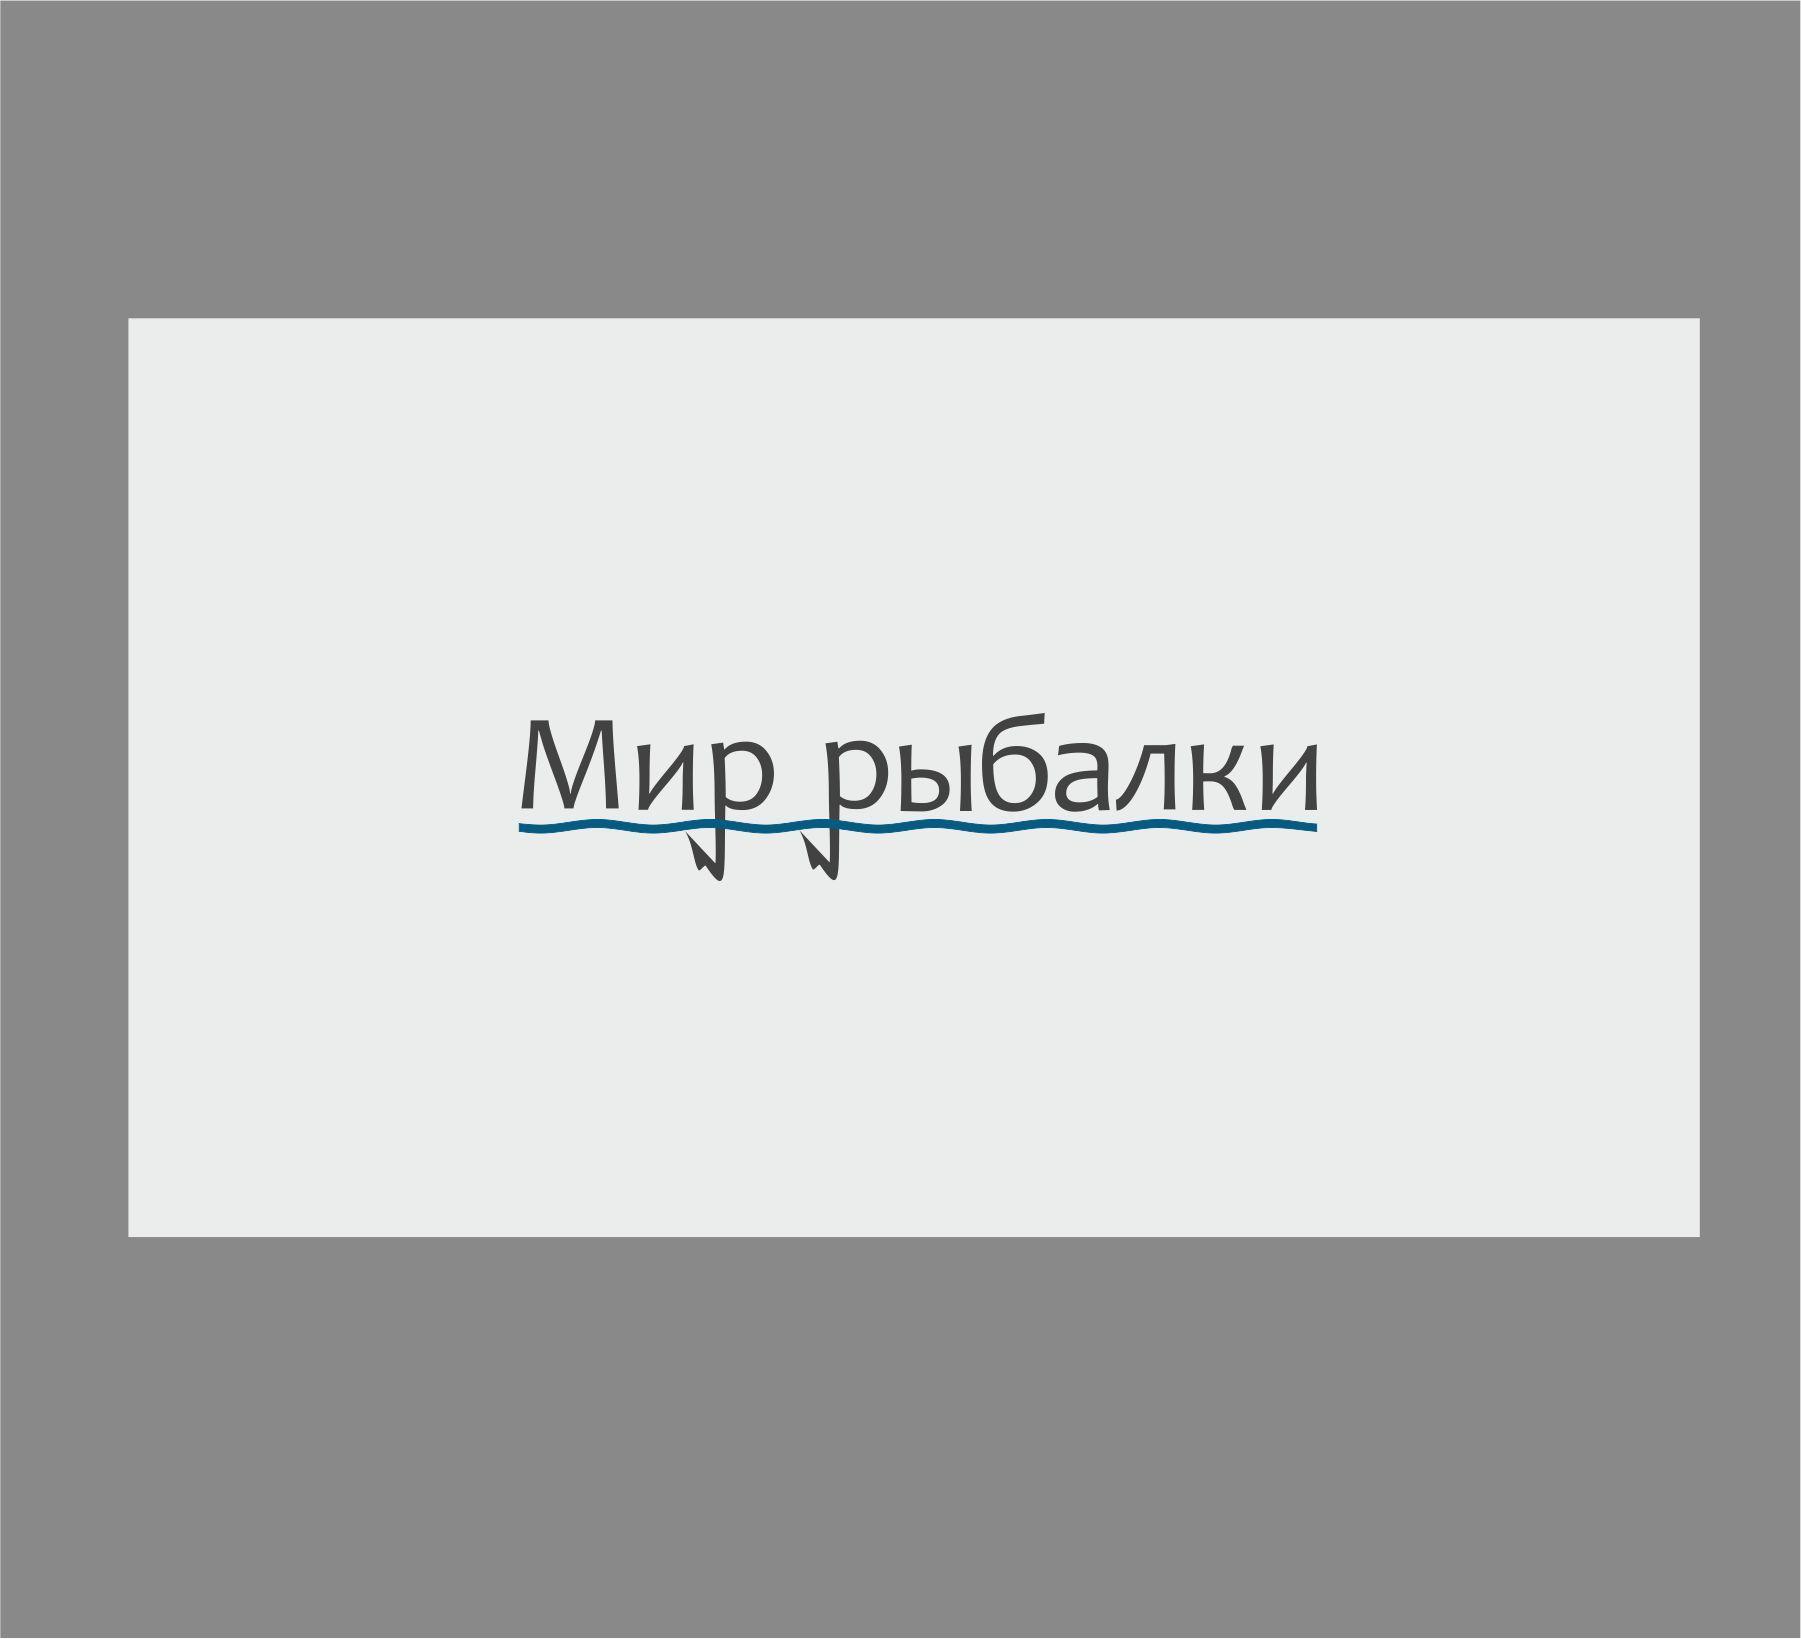 Логотип рыболовного магазина - дизайнер dbyjuhfl